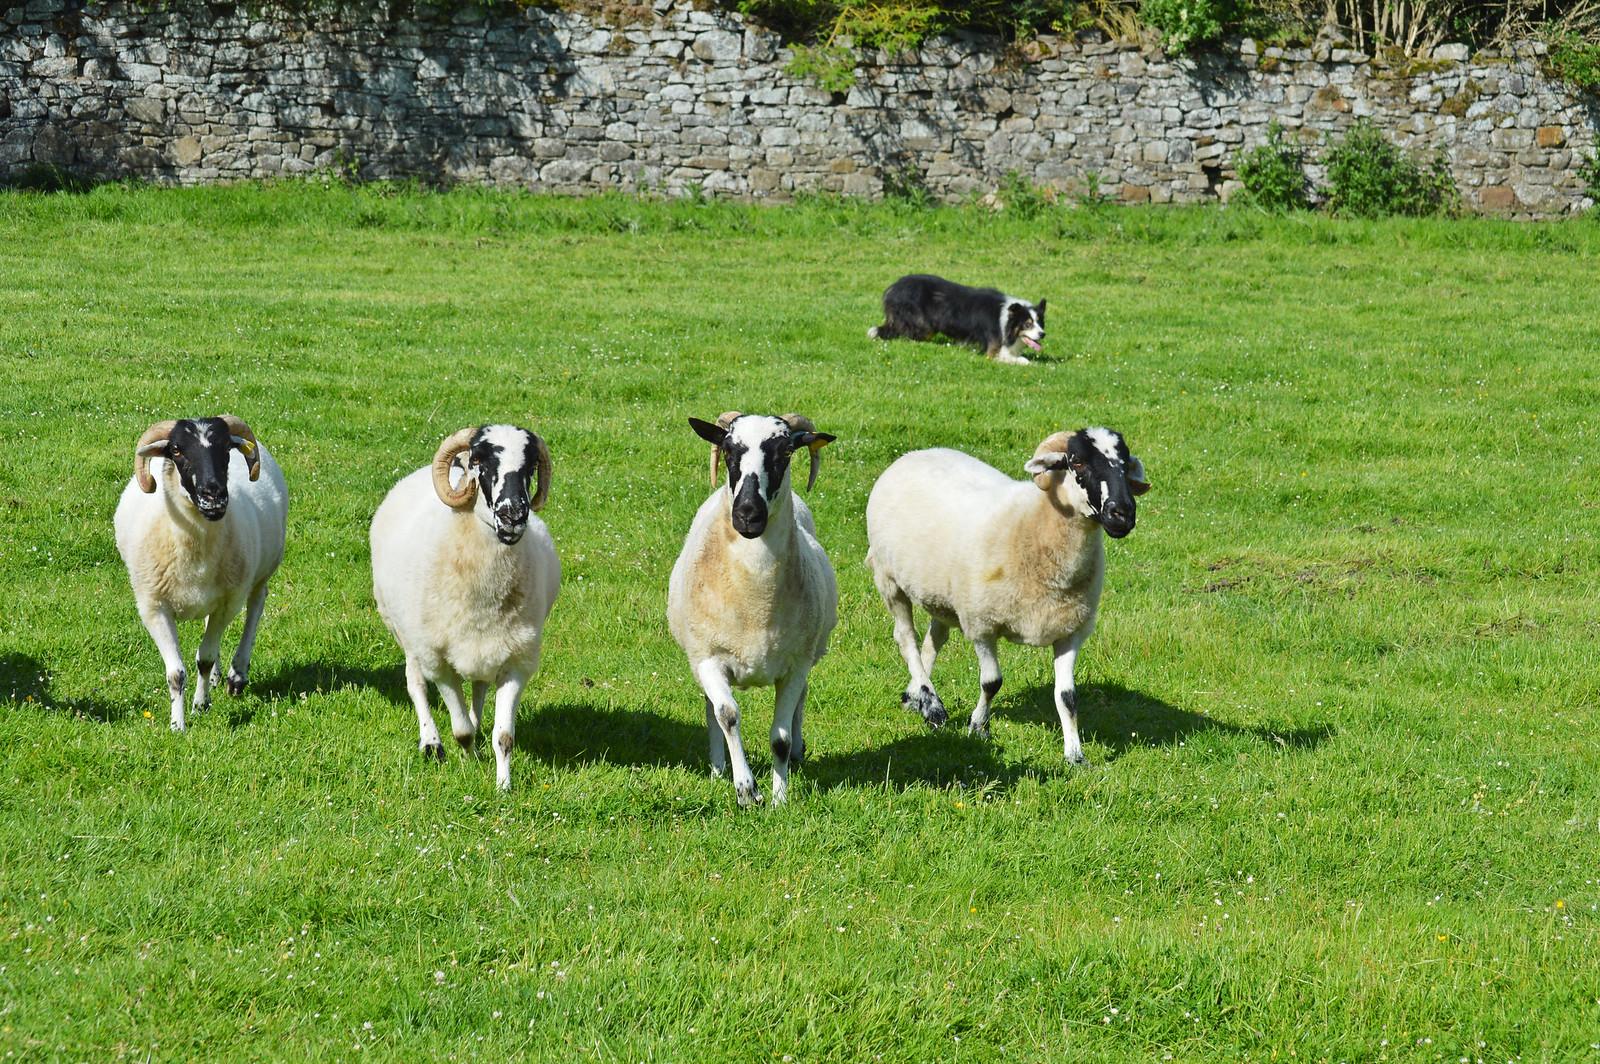 Sheep dog demonstration